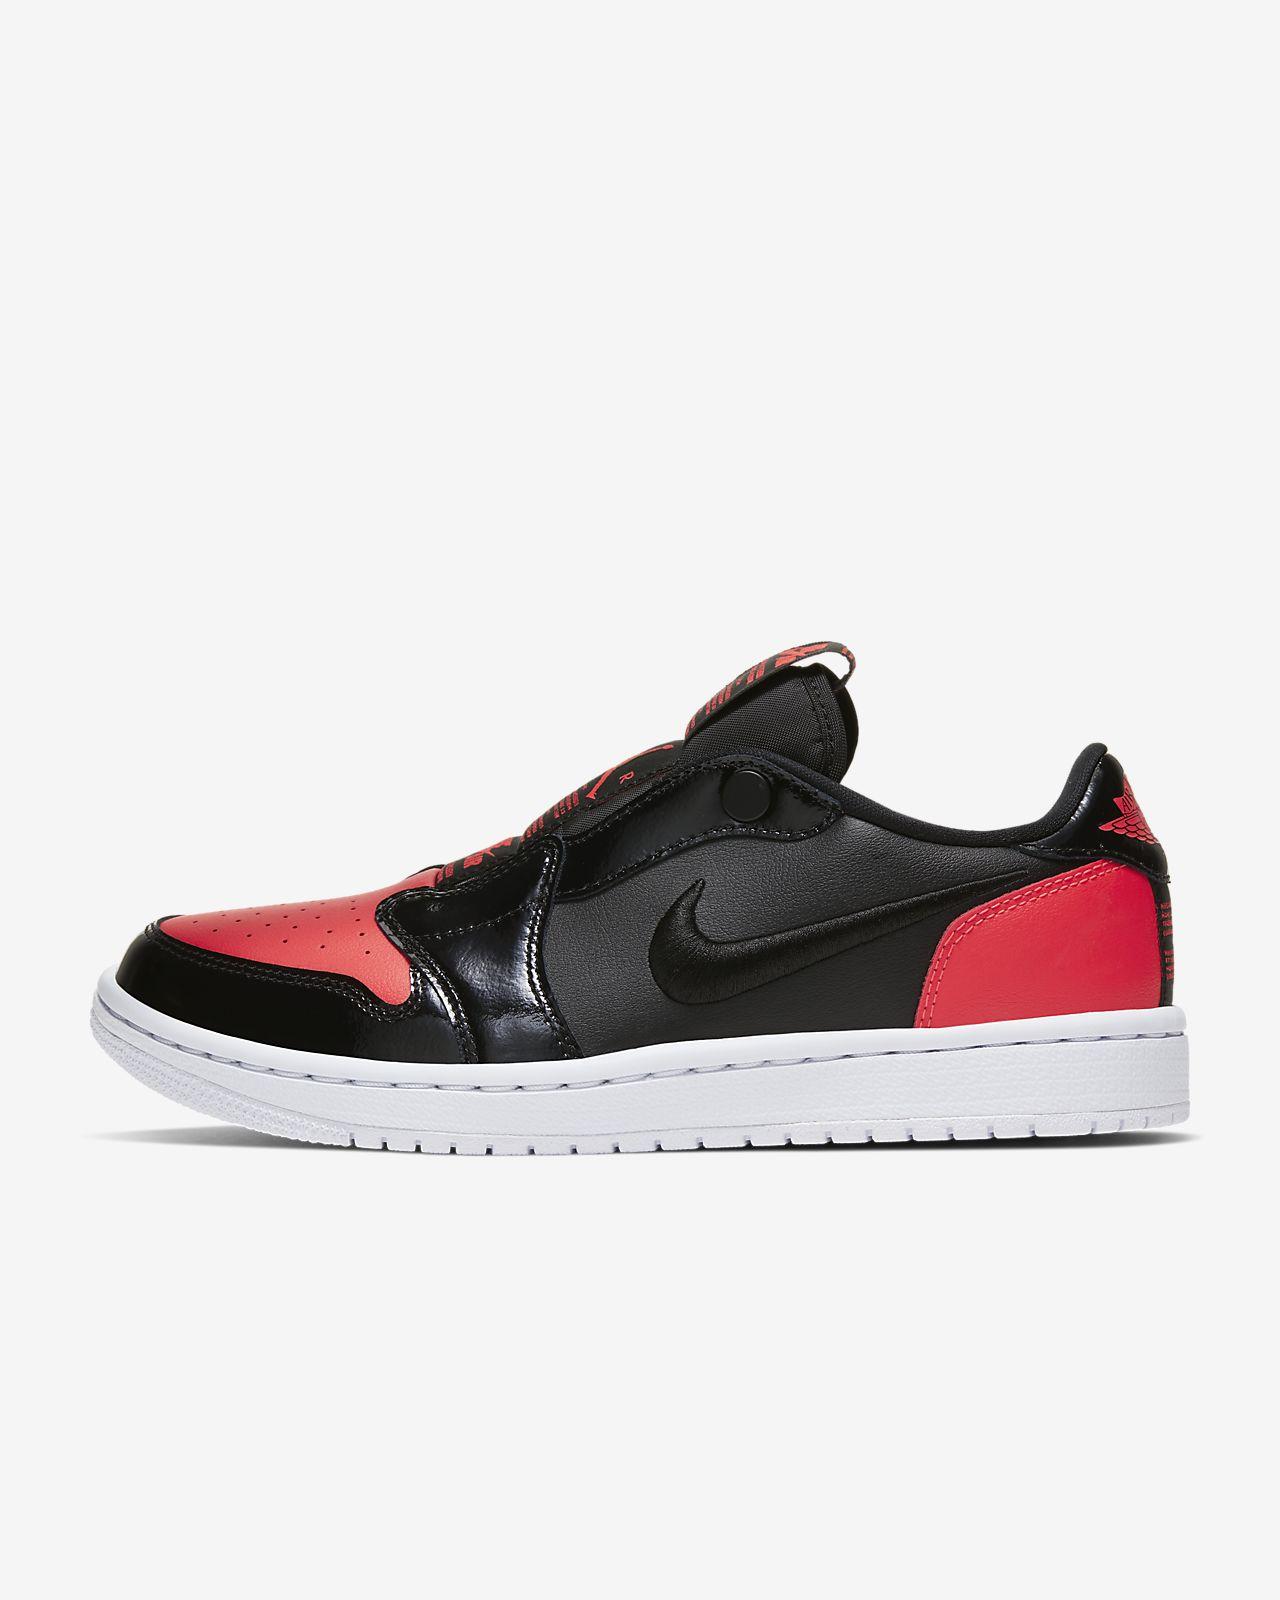 Buty damskie Air Jordan 1 Retro Low Slip